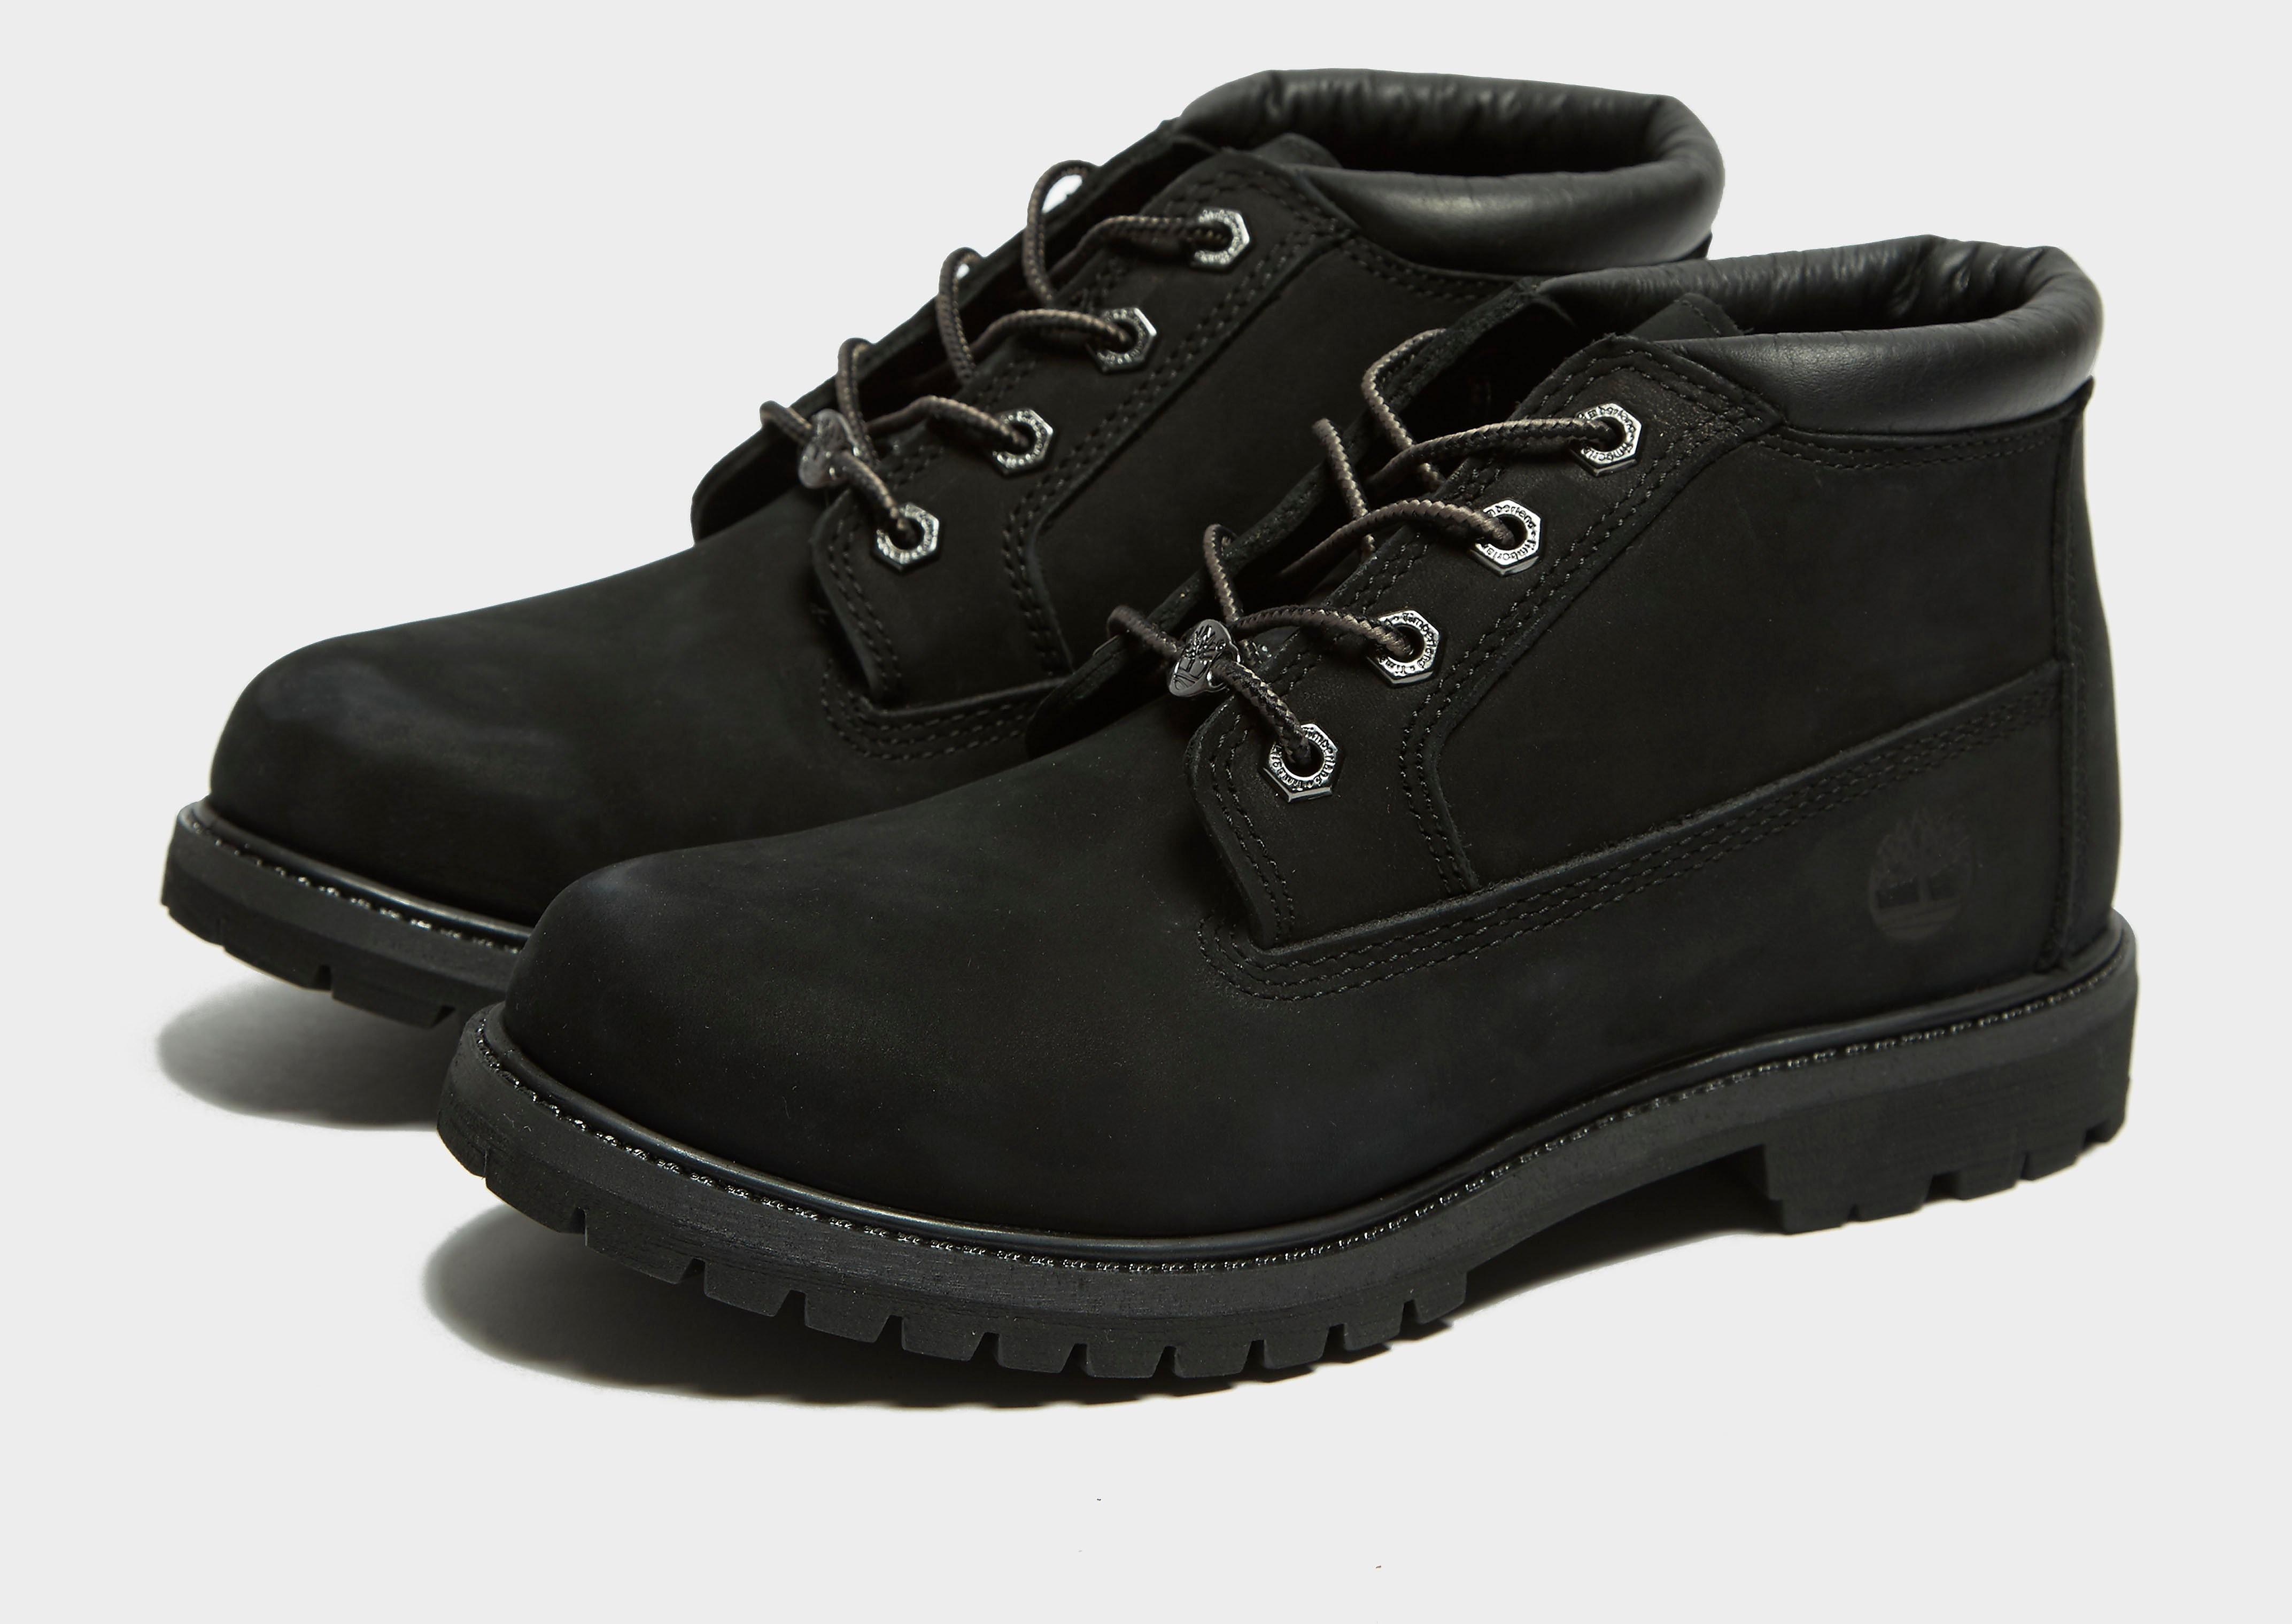 Timberland Nellie Boot Women's